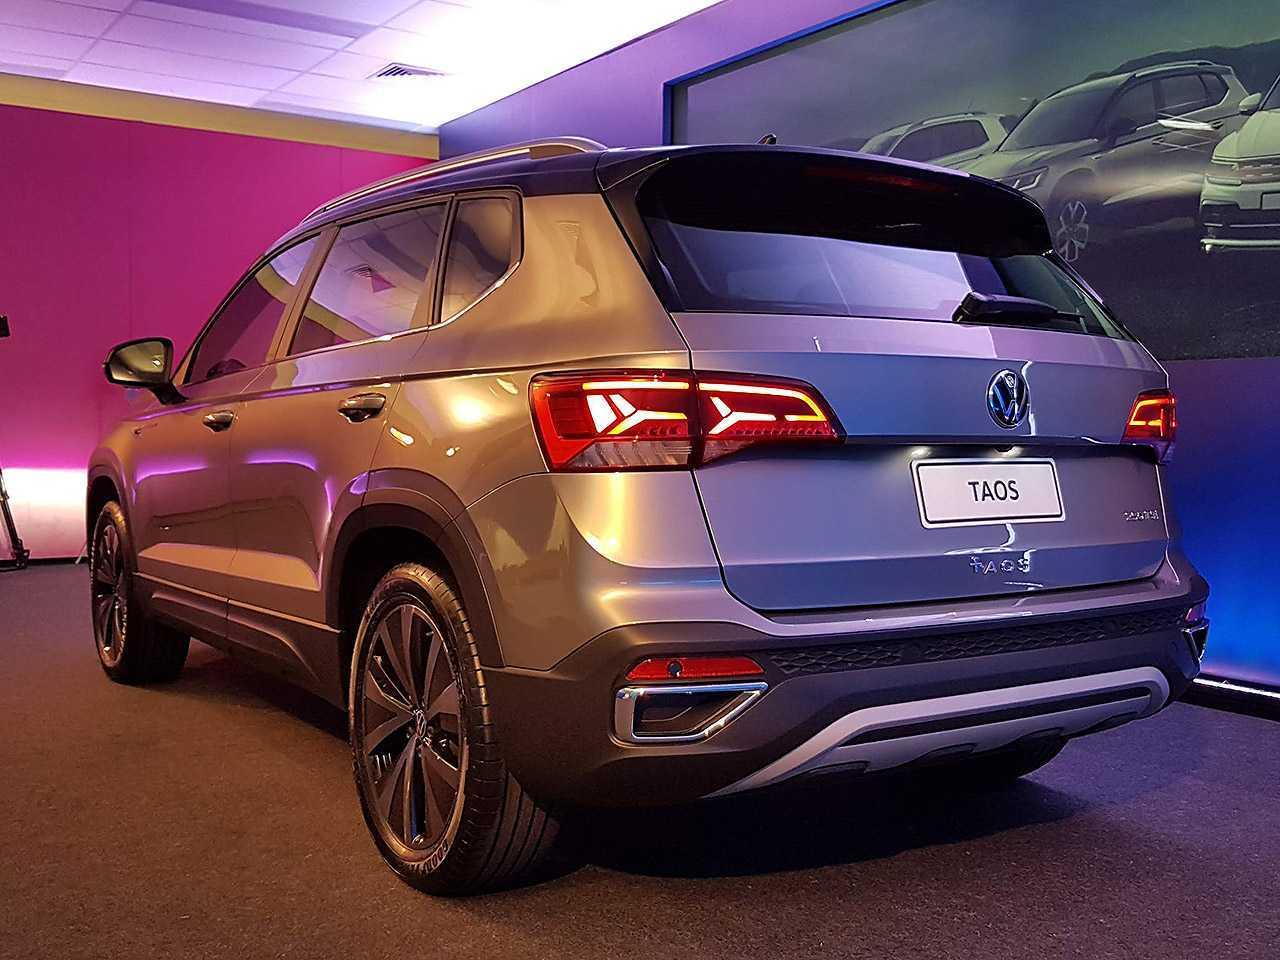 VolkswagenTaos 2022 - ângulo traseiro